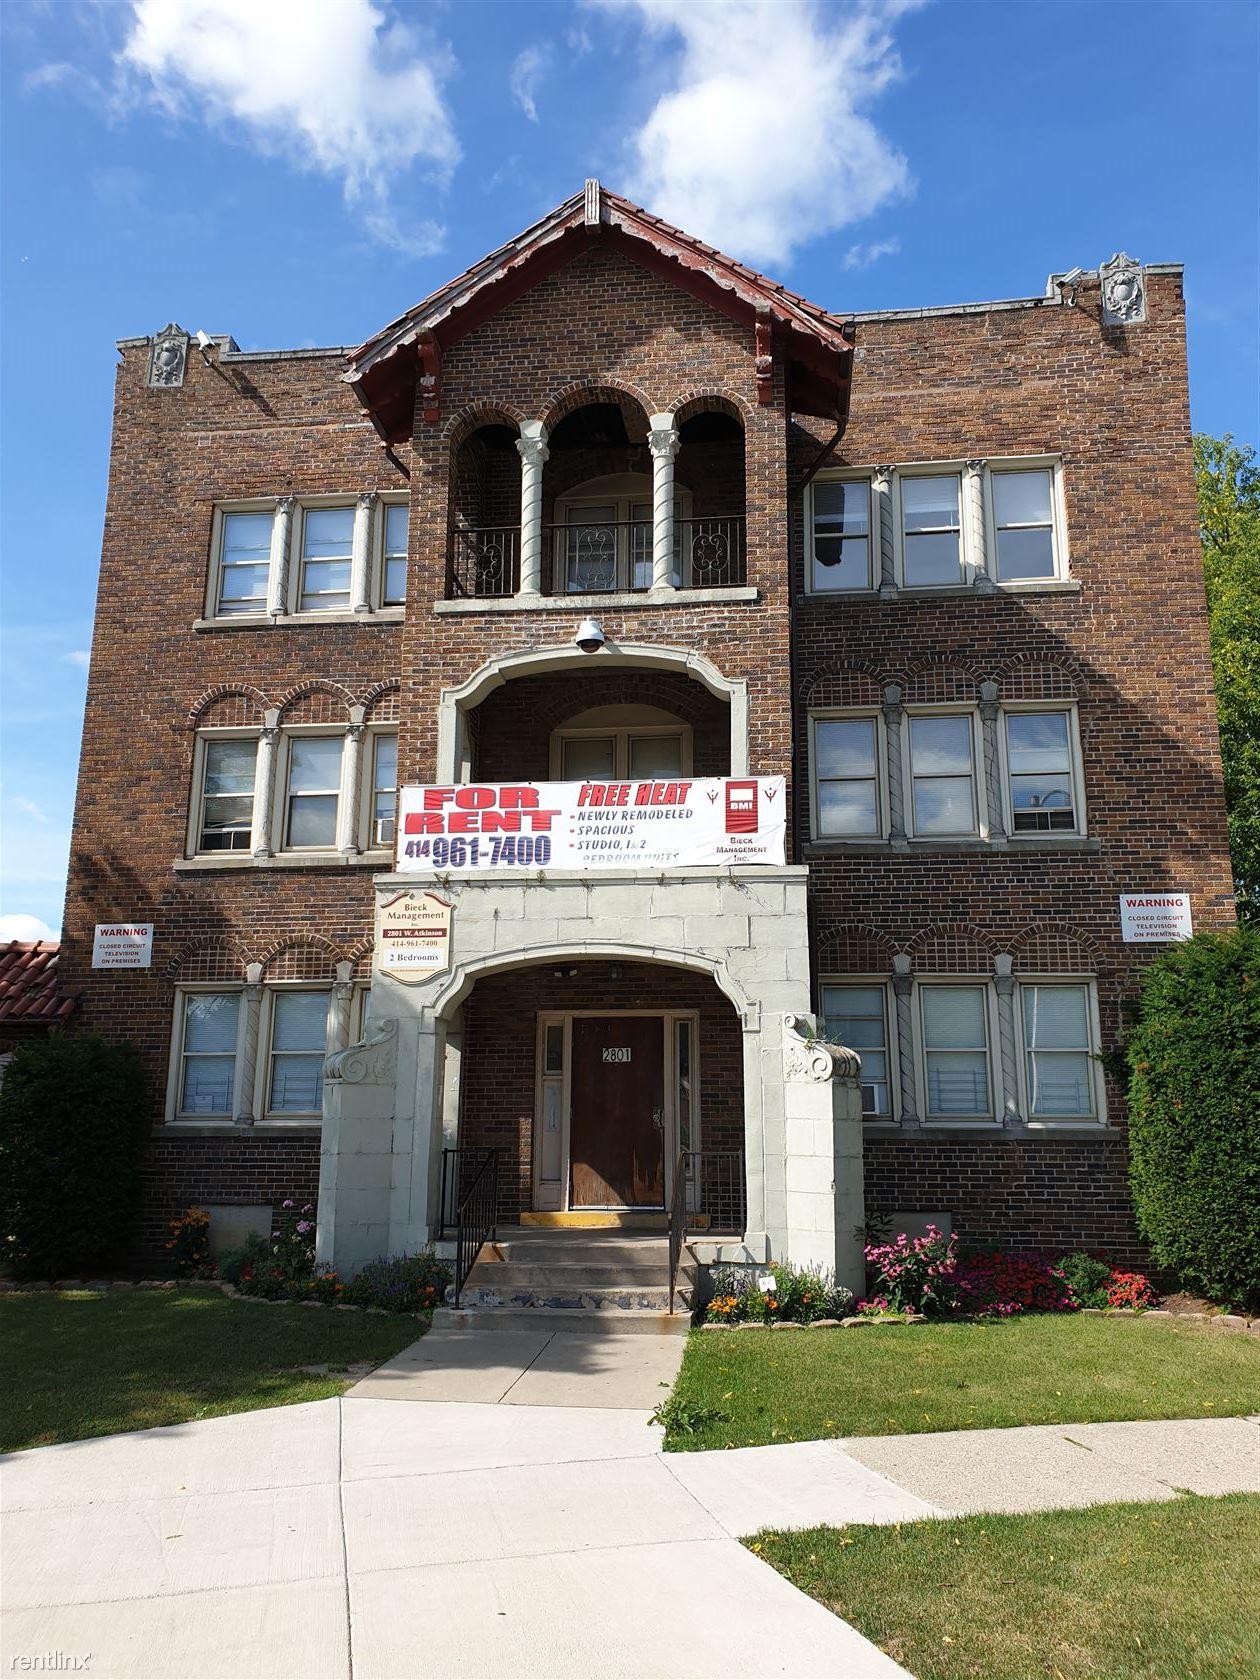 2801 W Atkinson Ave, Milwaukee, WI - $490